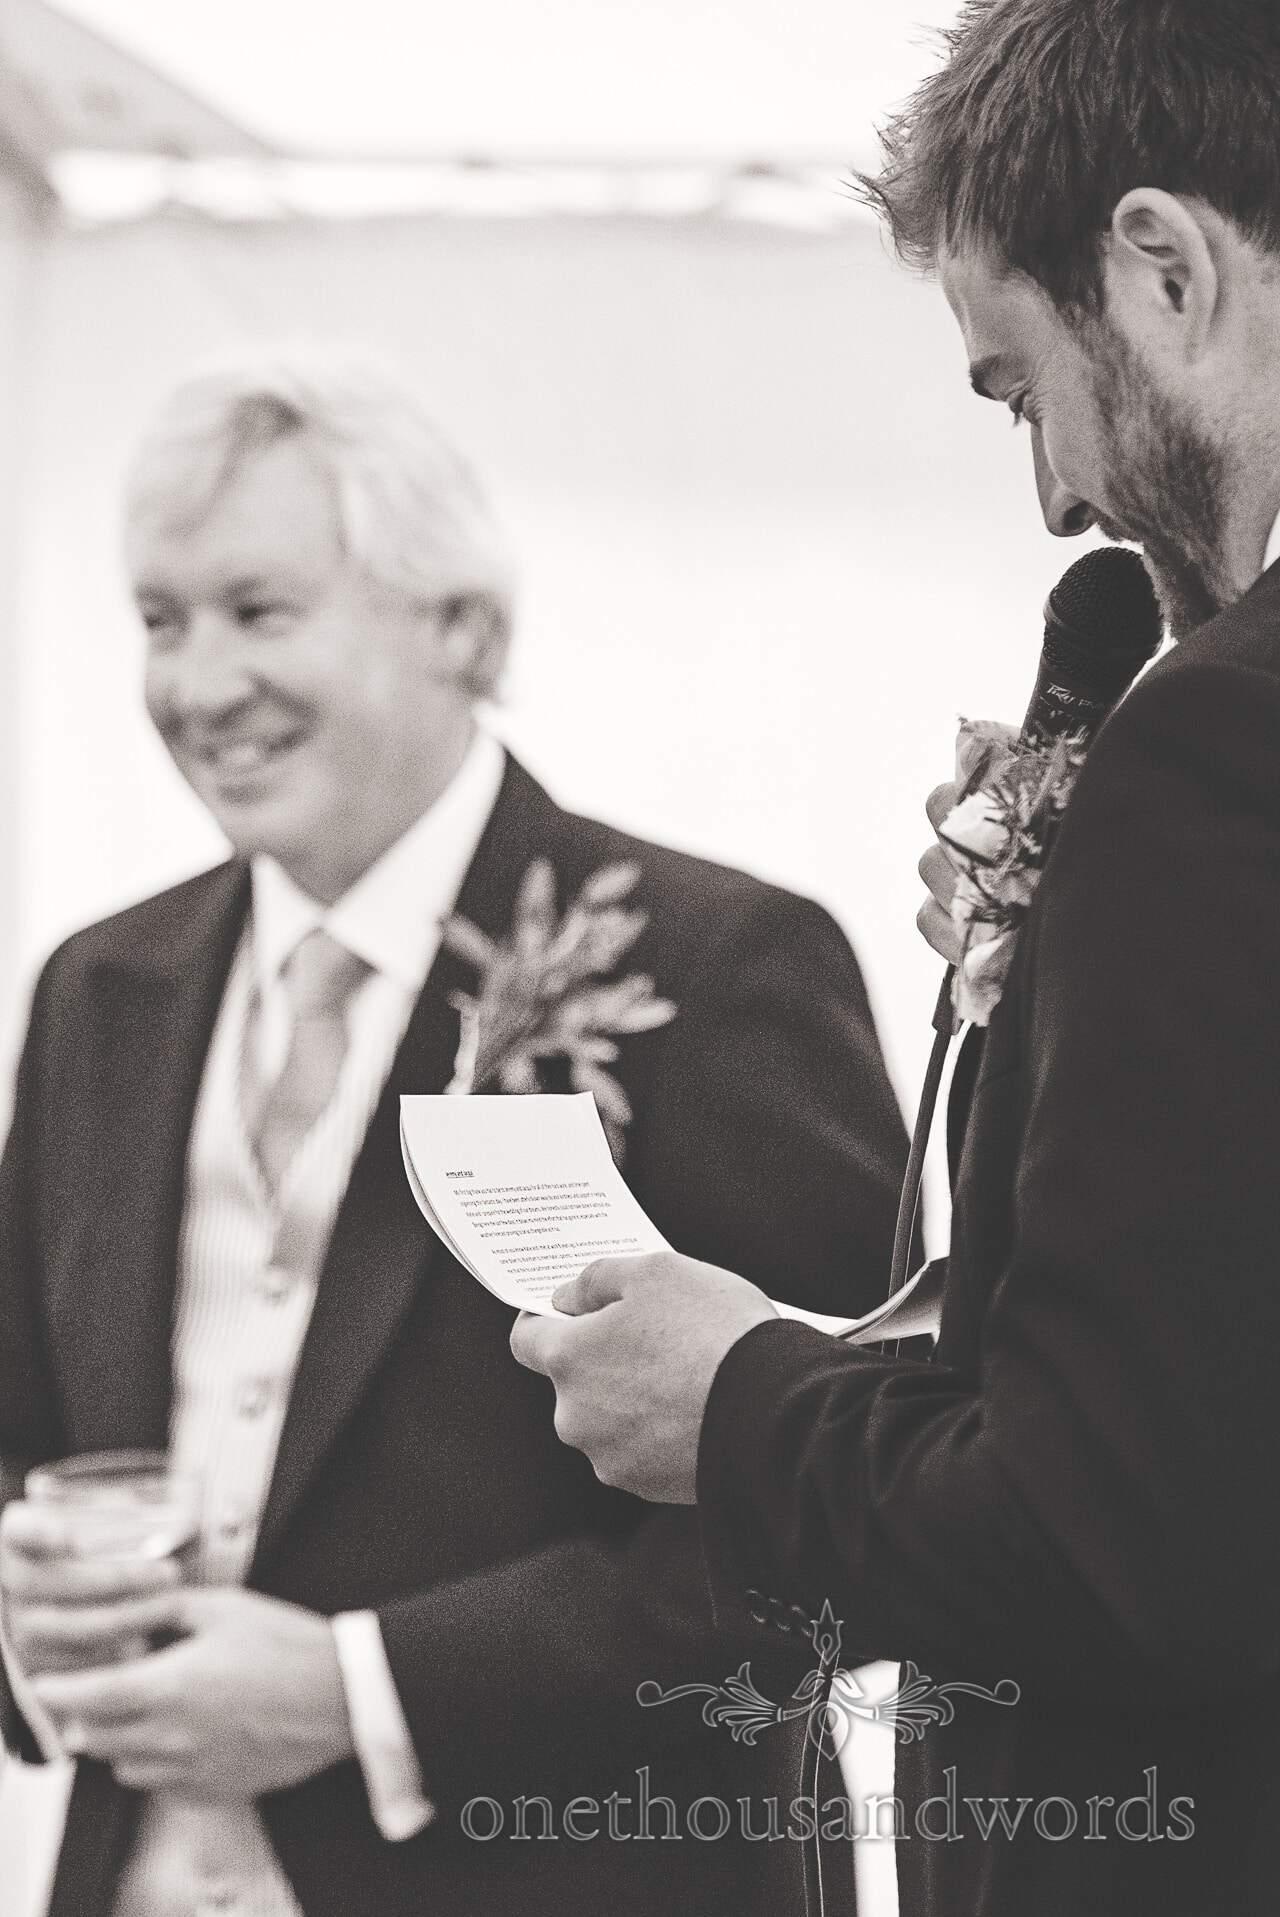 Black and White wedding photograph of groom reading speech